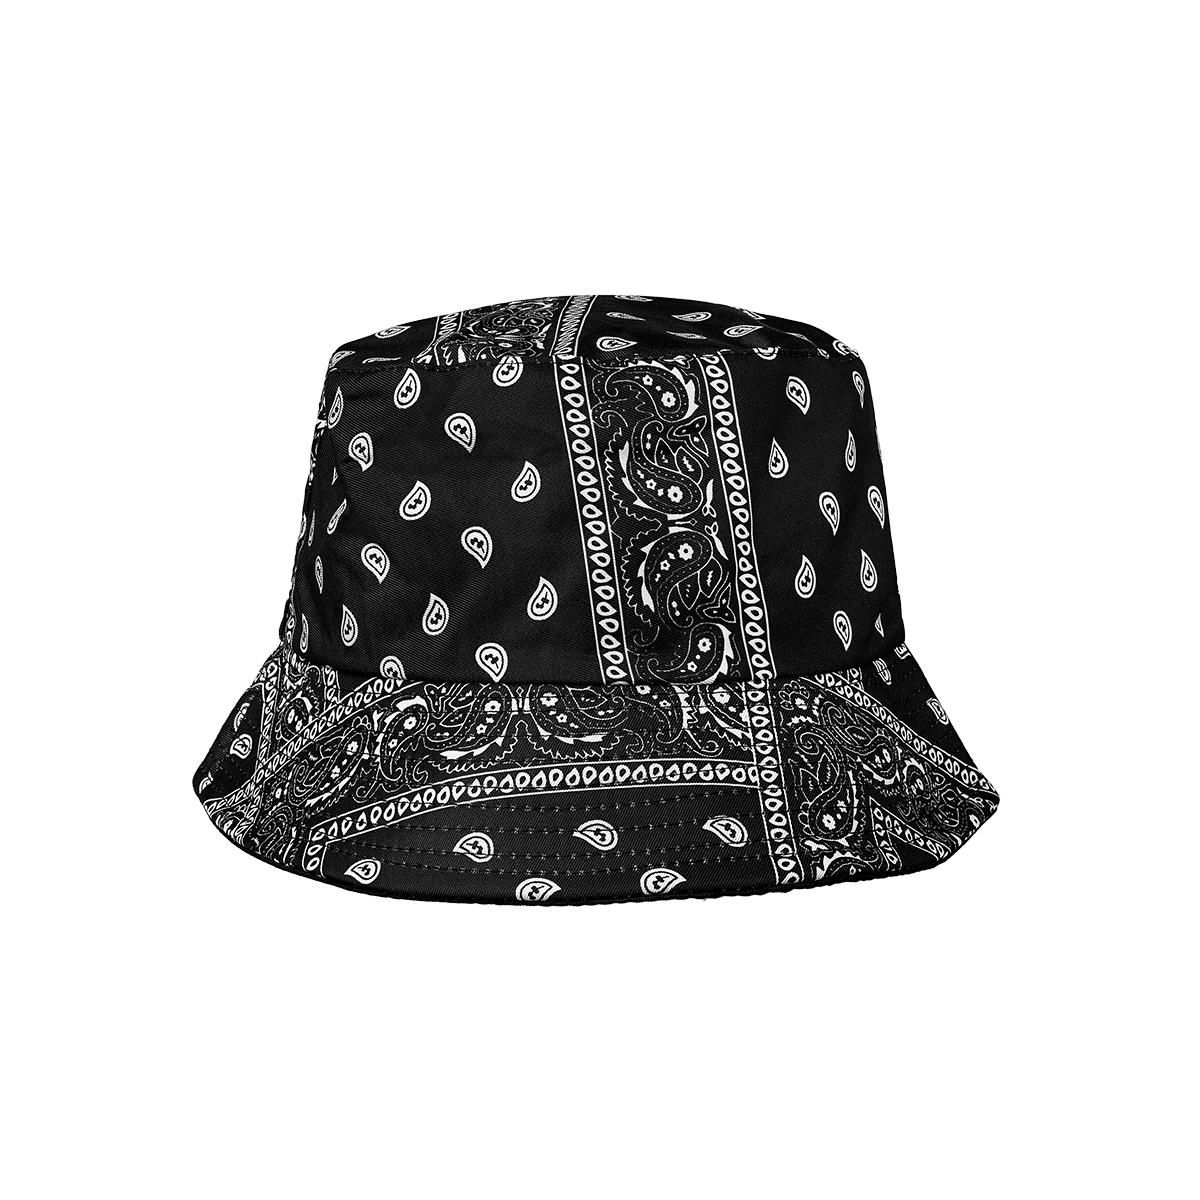 Sombrero de pescador con estampado de bandana